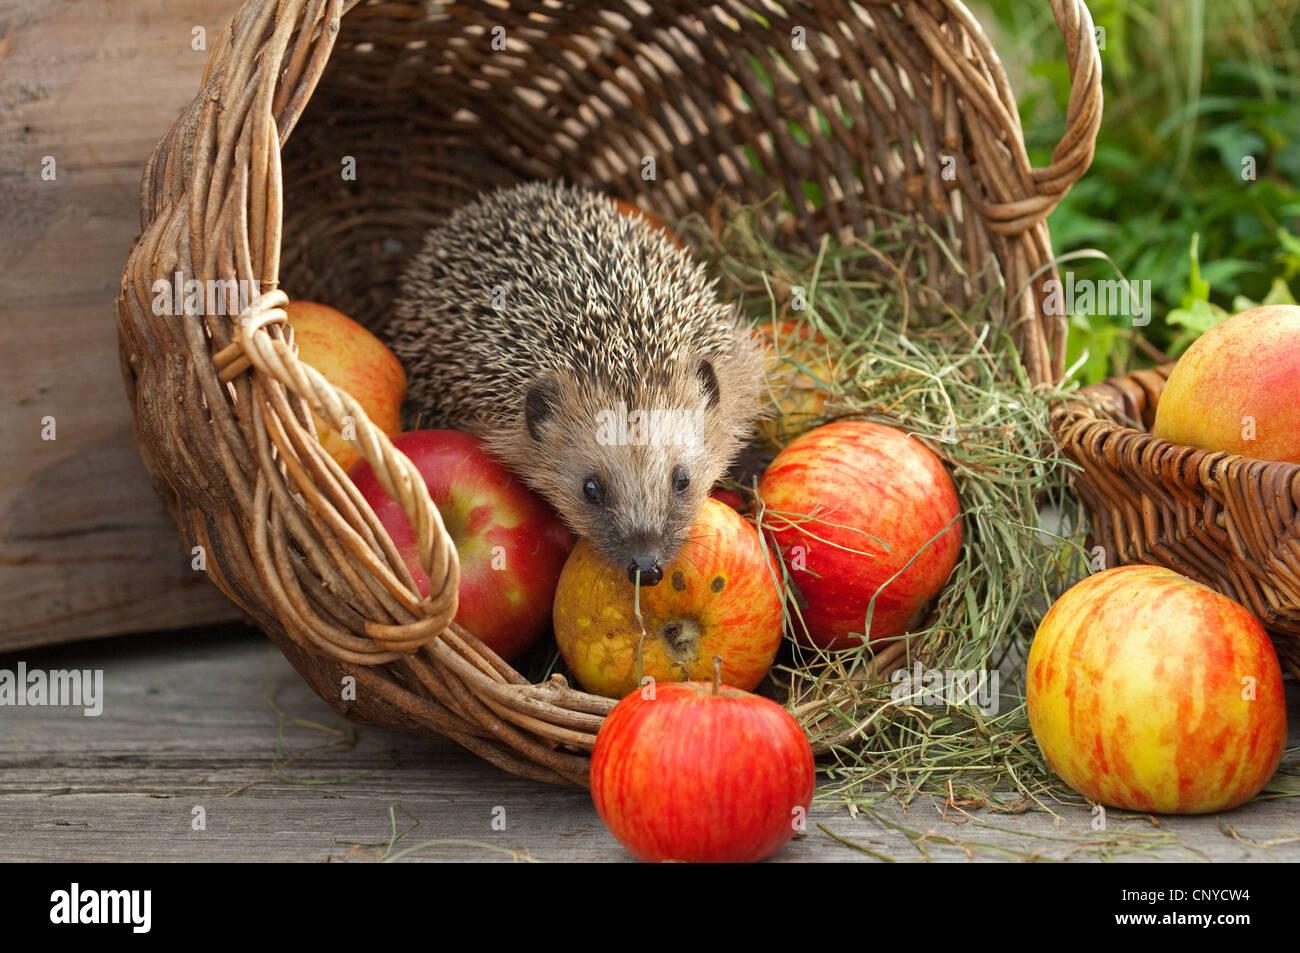 Western hedgehog, European hedgehog (Erinaceus europaeus), climbing in a basket with apples, Germany, Bavaria - Stock Image